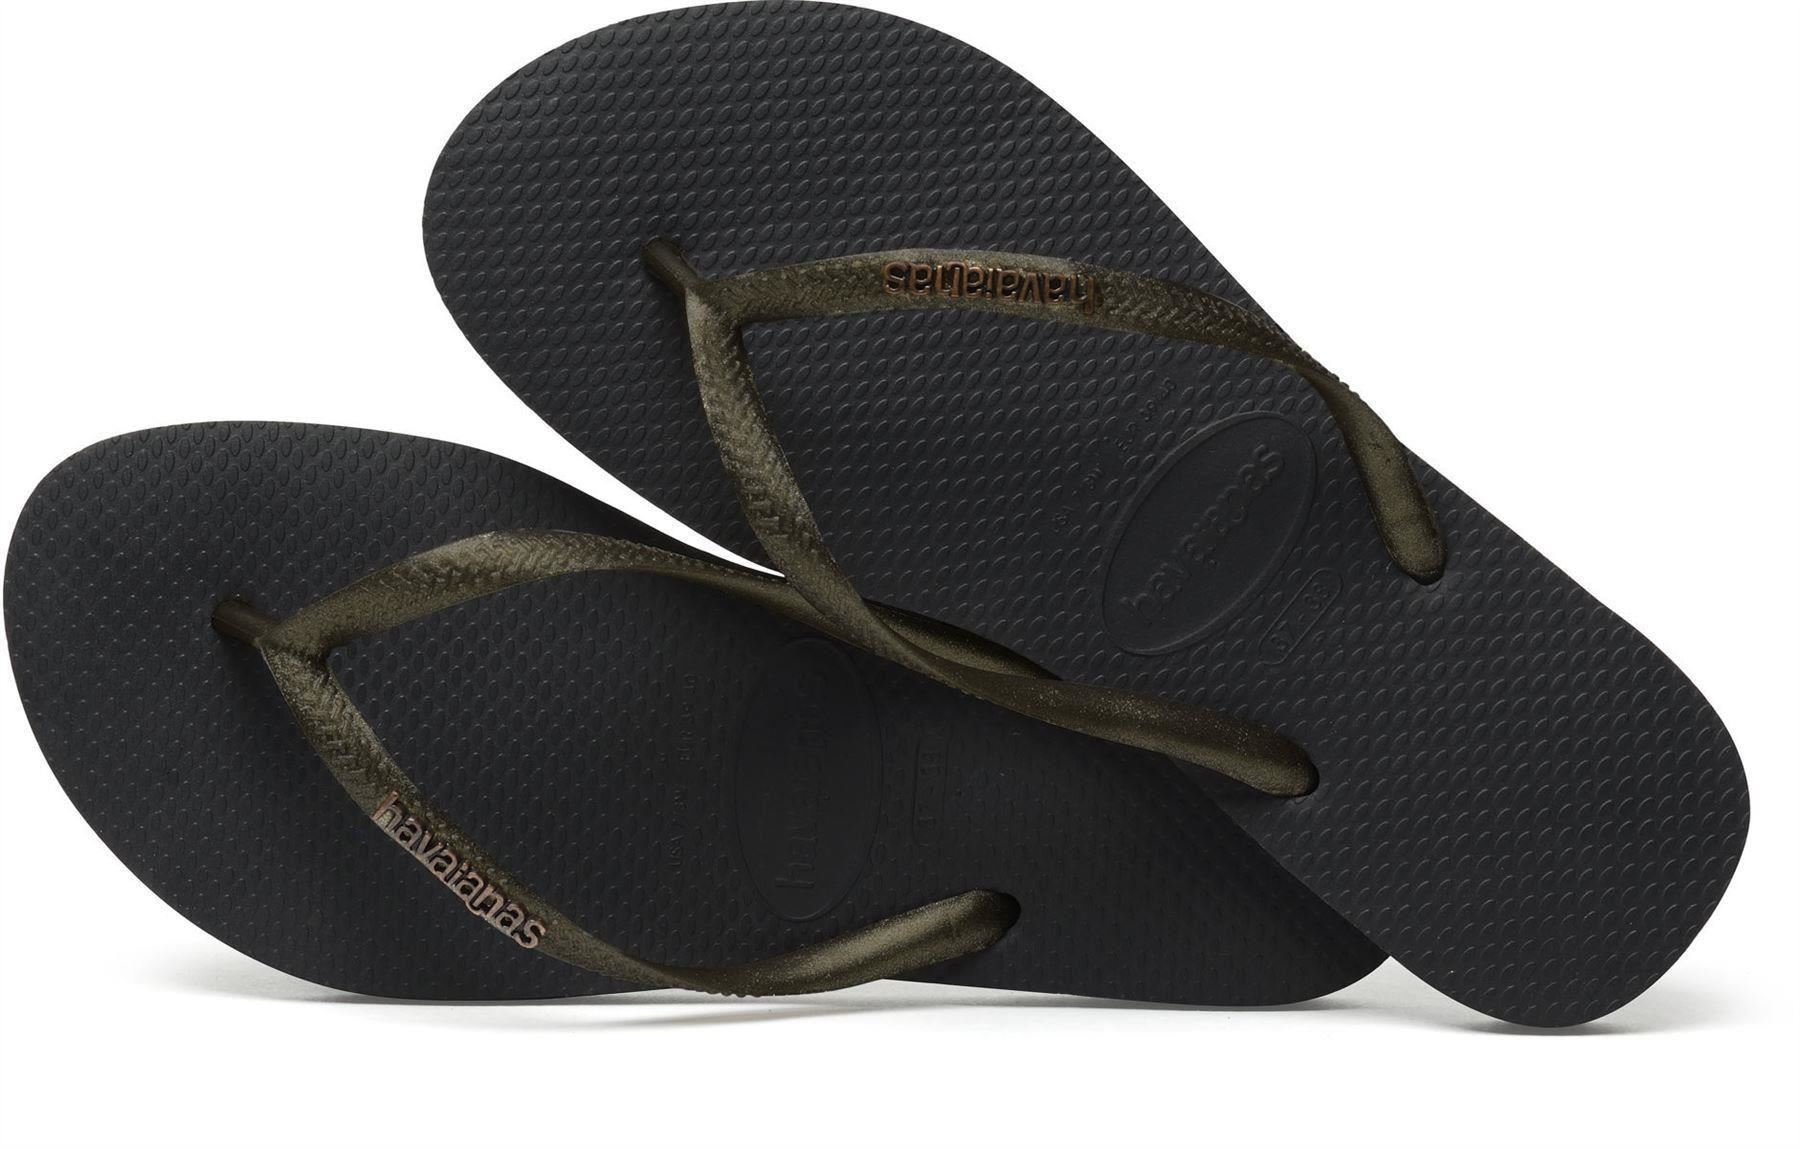 f480dde66 Havaianas Women`s Flip Flops Slim Logo Black Gold Sandals Any Size ...